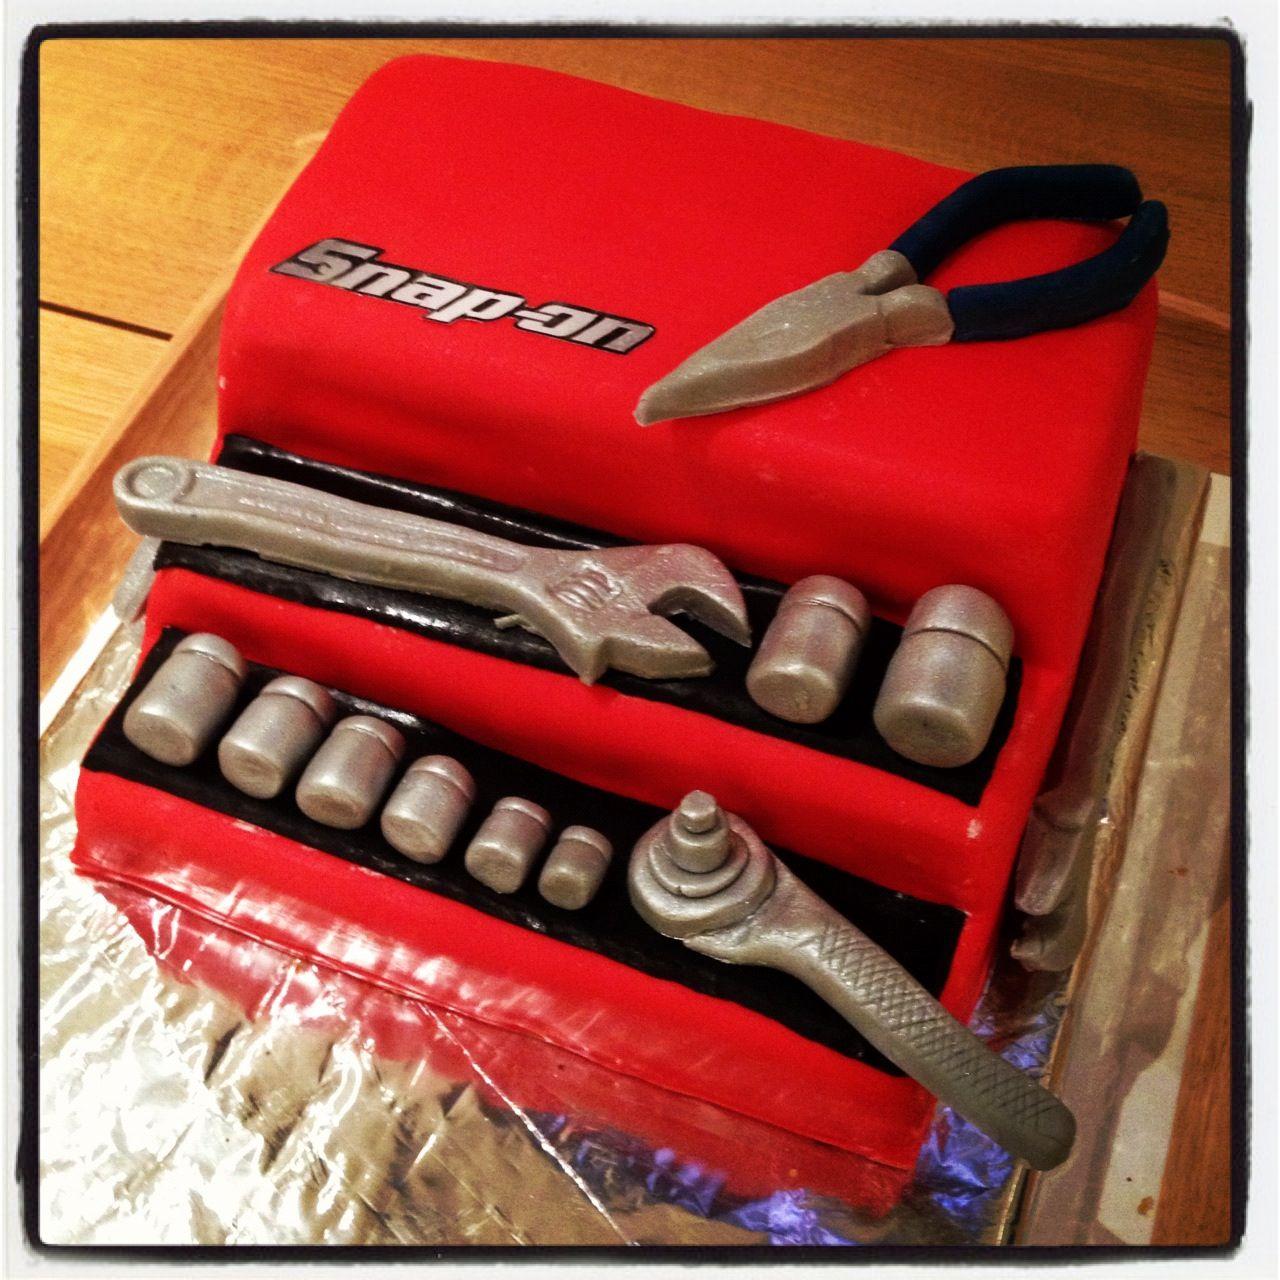 25 Best Ideas About Tool Box Dresser On Pinterest: Best 25+ Mechanic Cake Ideas On Pinterest